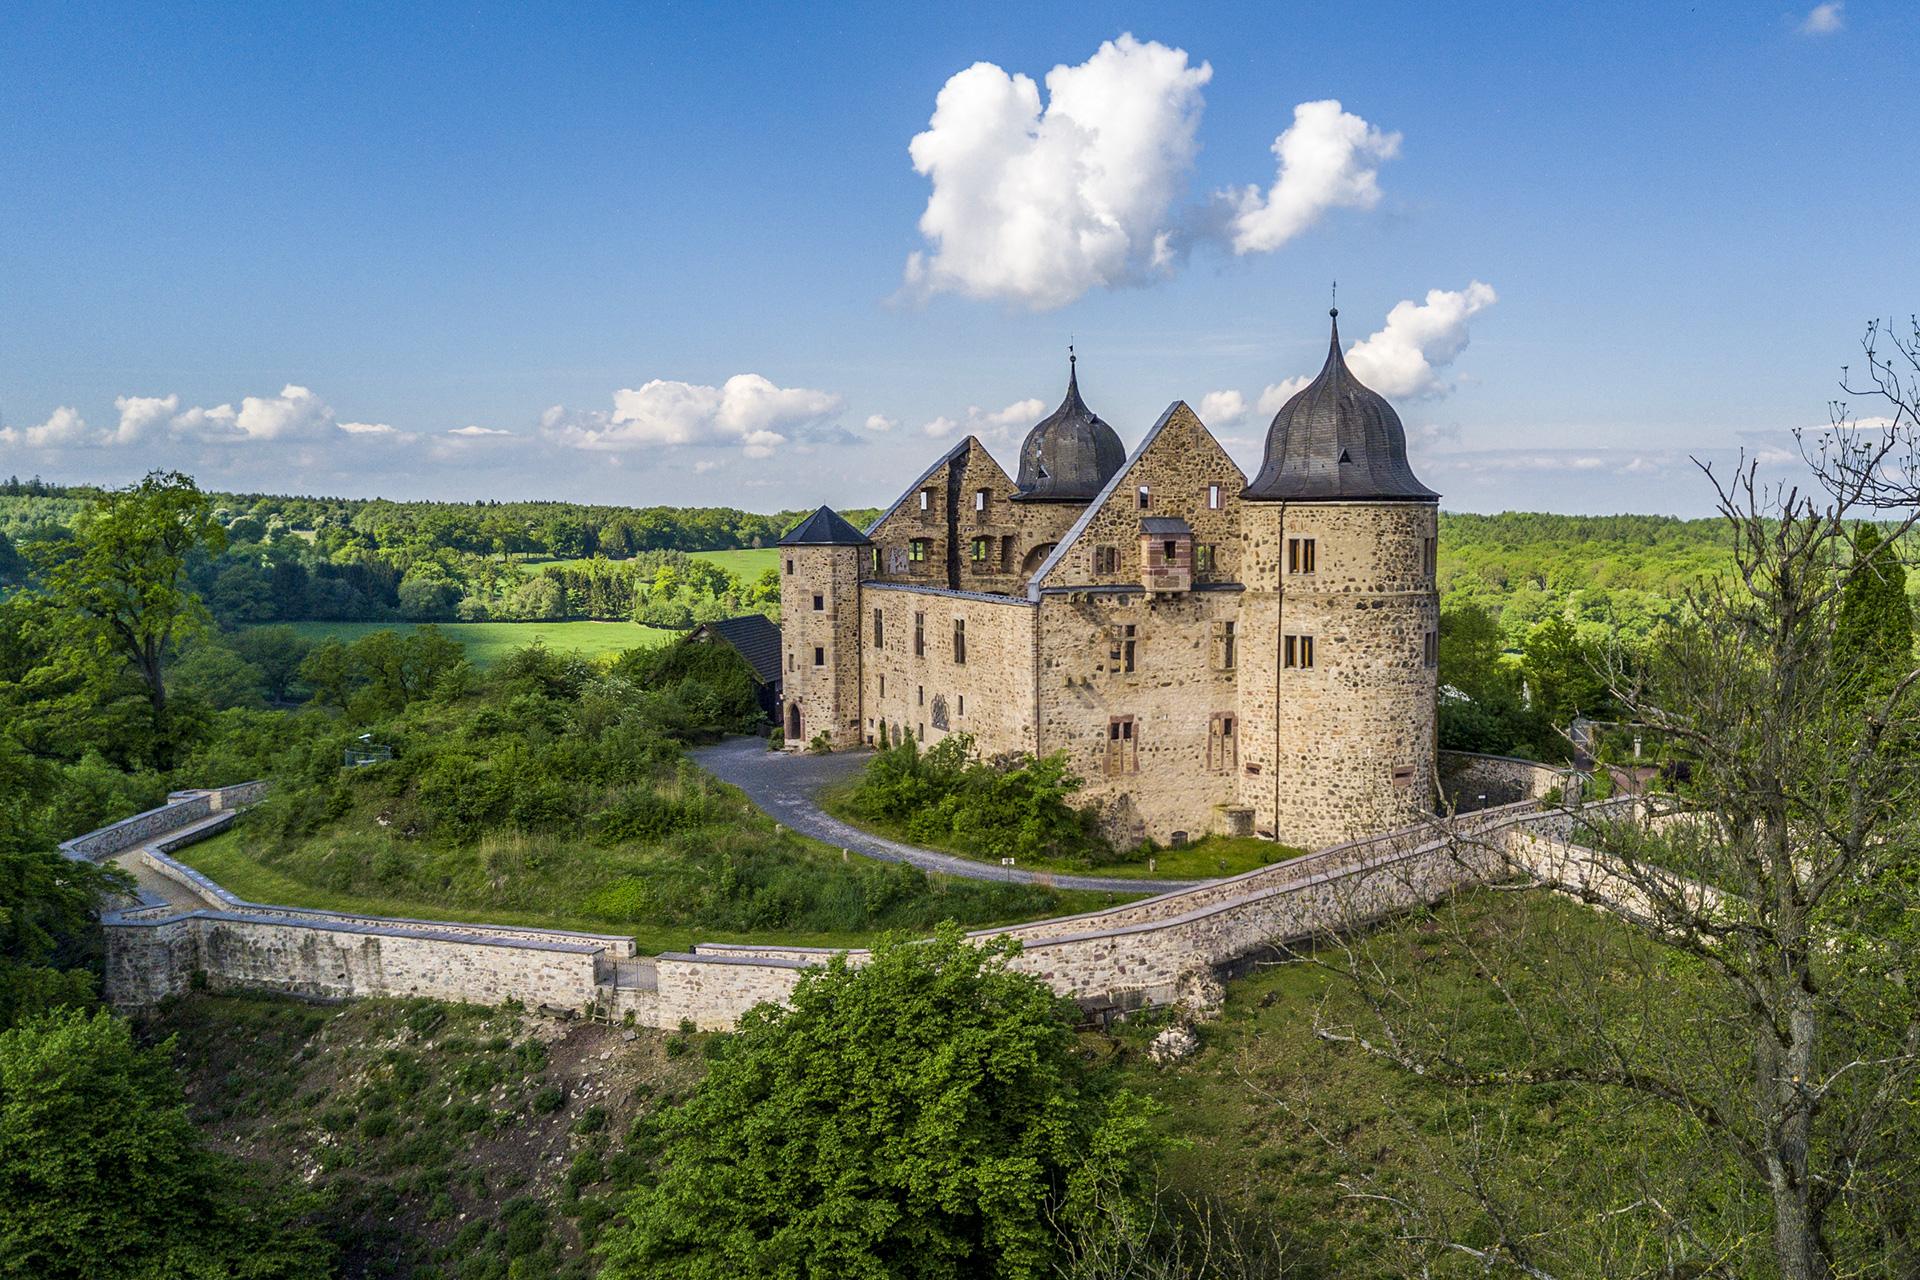 Castle Sababurg in Germany; Courtesy of IURII BURIAK/Shutterstock